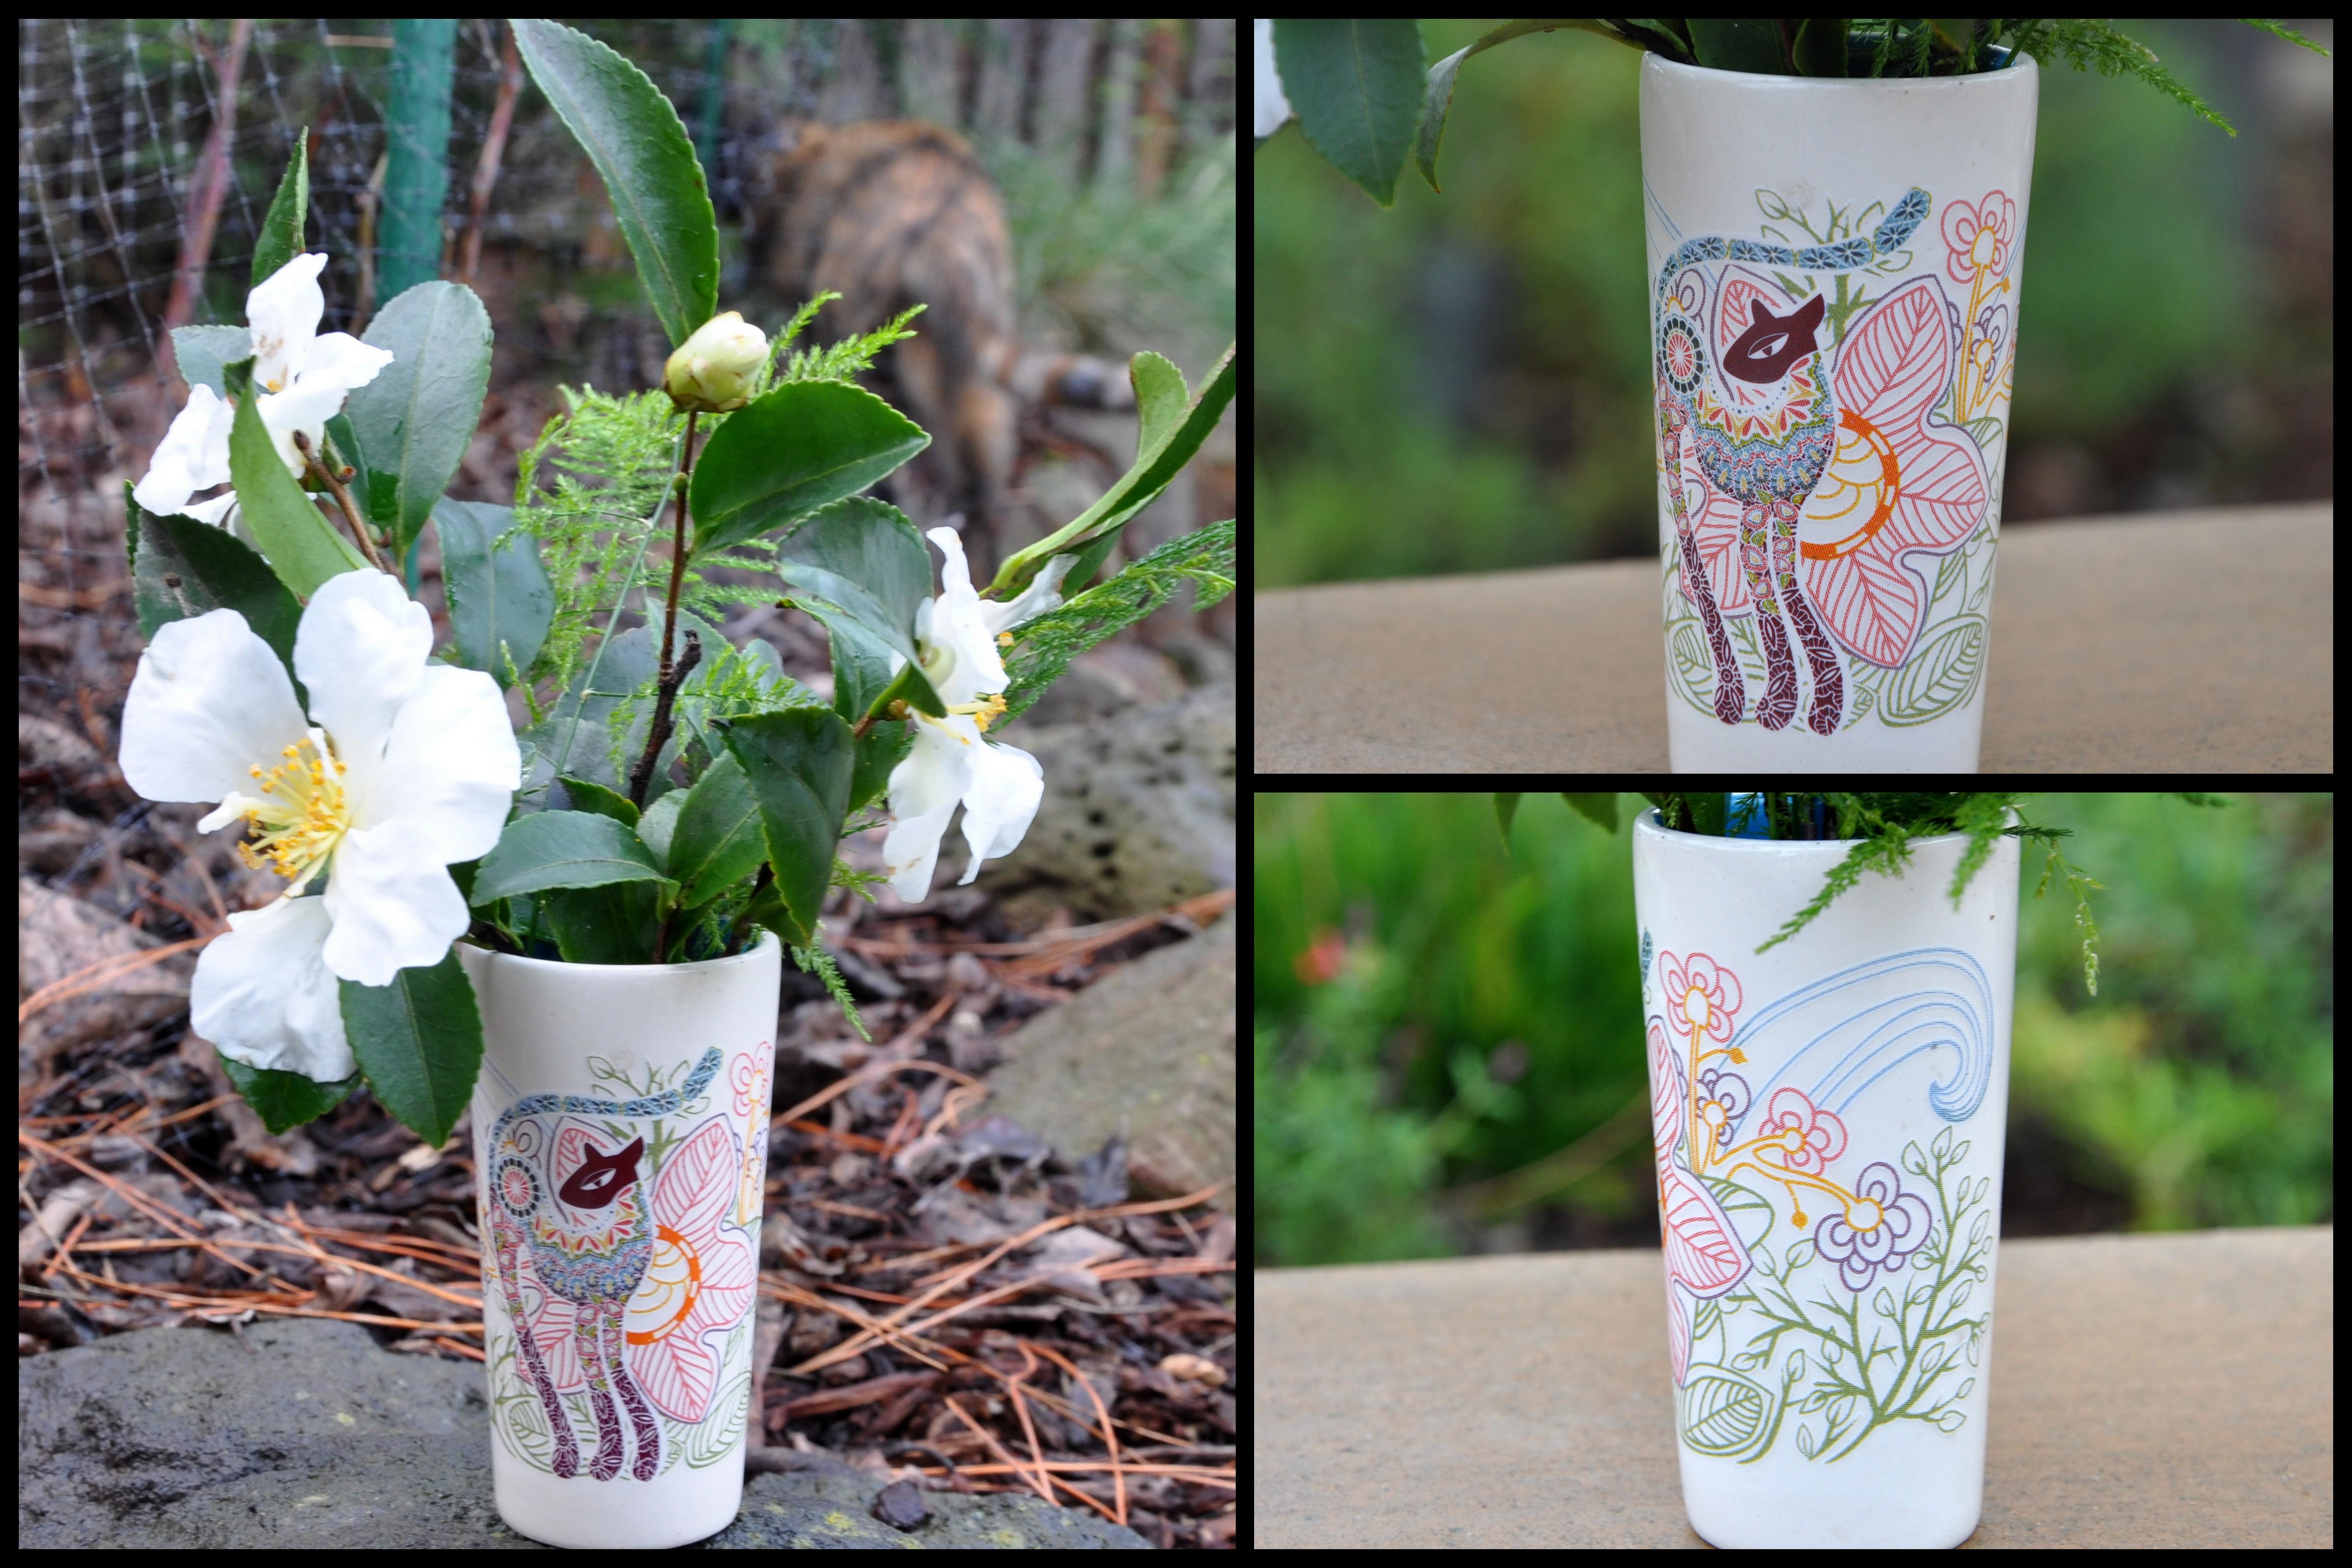 In a vase on monday gardening nirvana puerto vallarta cat vase reviewsmspy